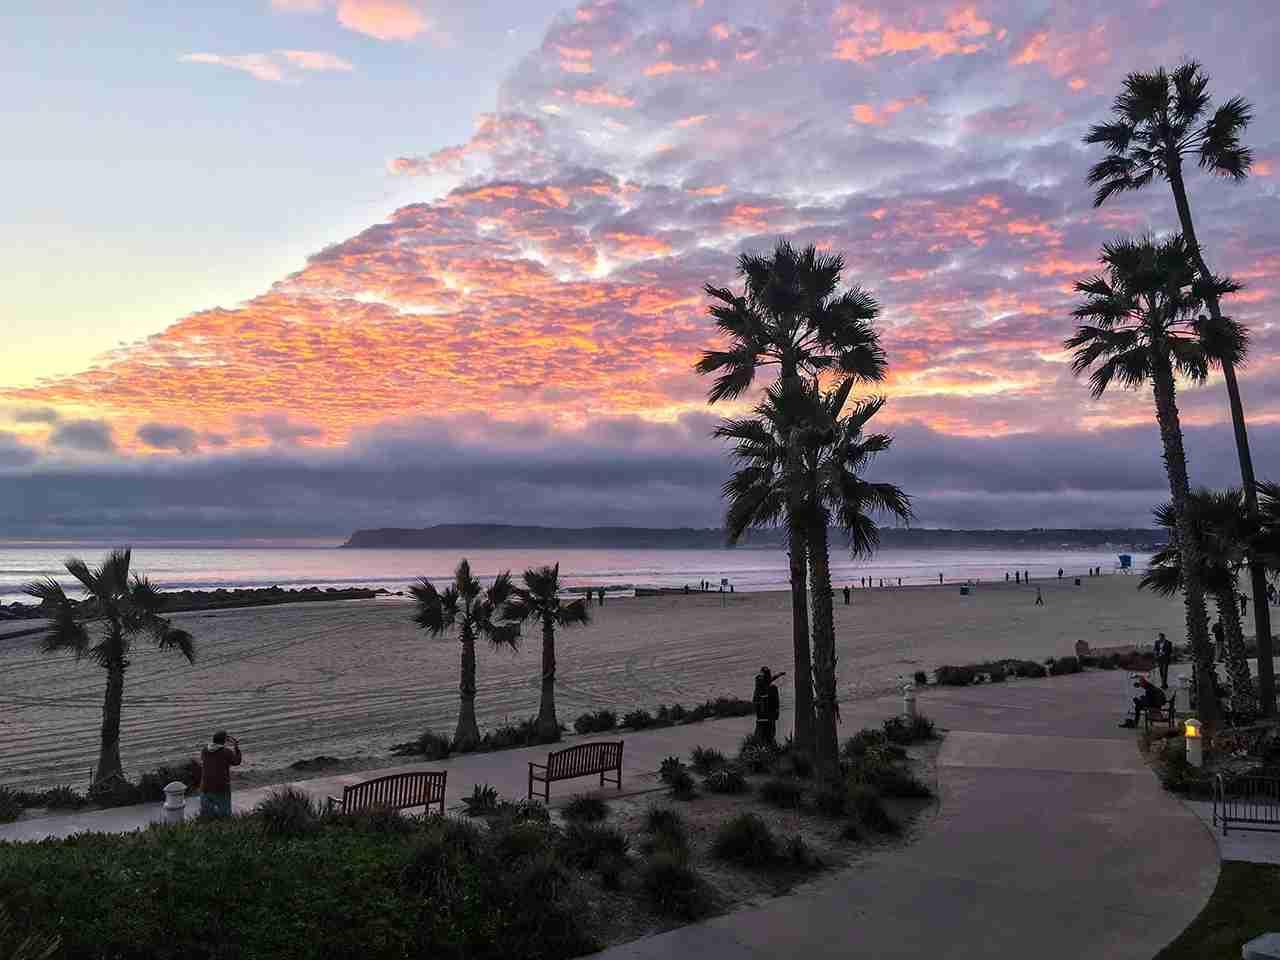 Sunset on Coronado Island Beach in San Diego, California. (Photo by anouchka / Getty Images)